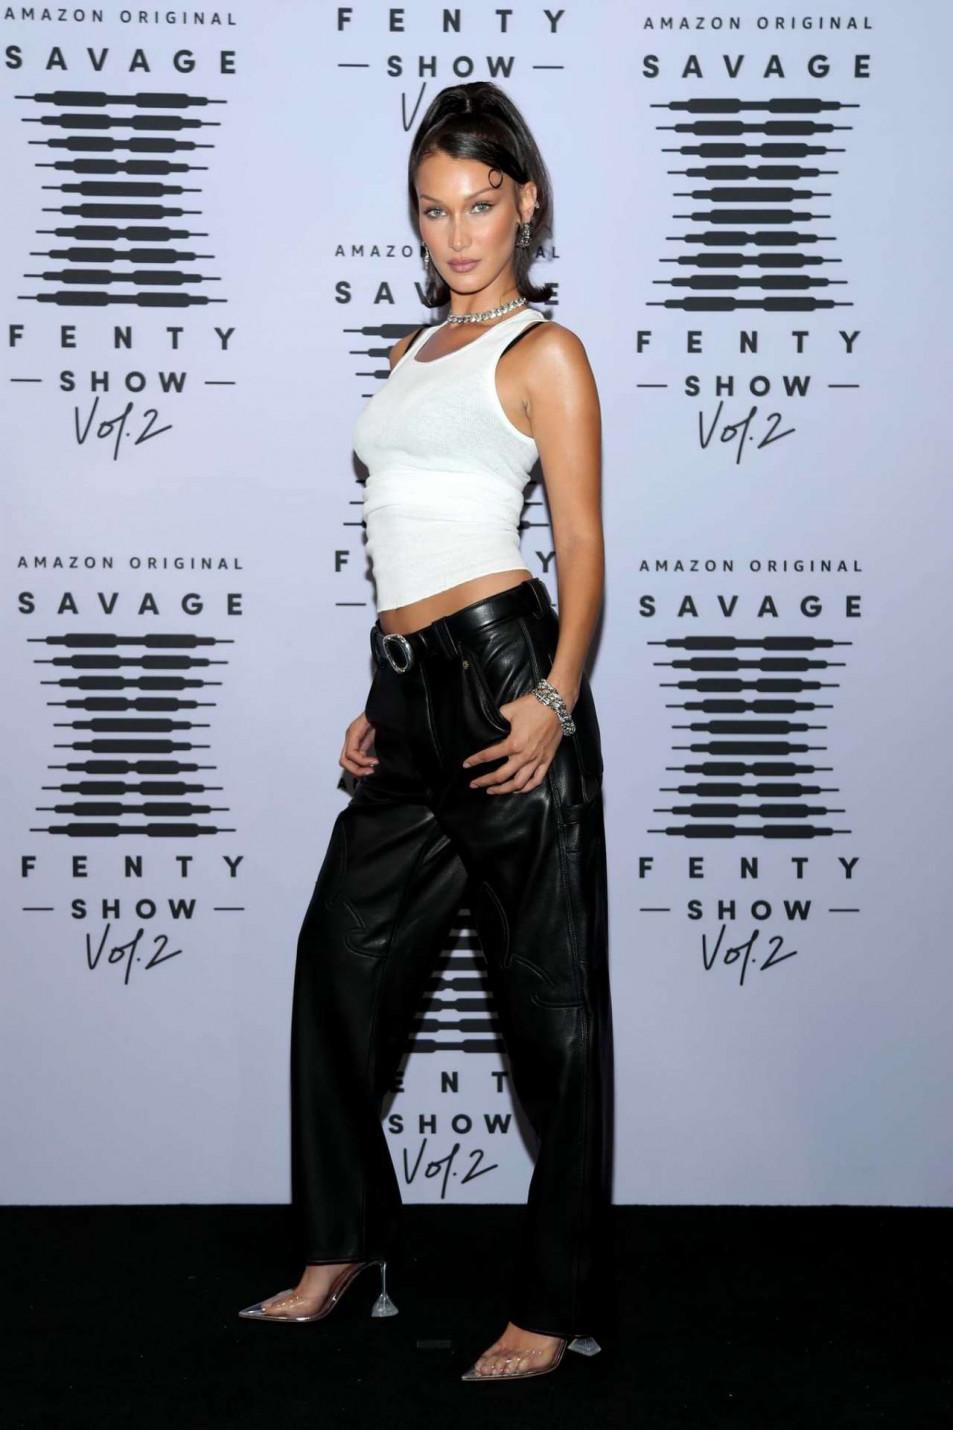 Bella-Hadid-black-lingerie-Rihannas-Savage-X-Fenty-Show-1.jpg